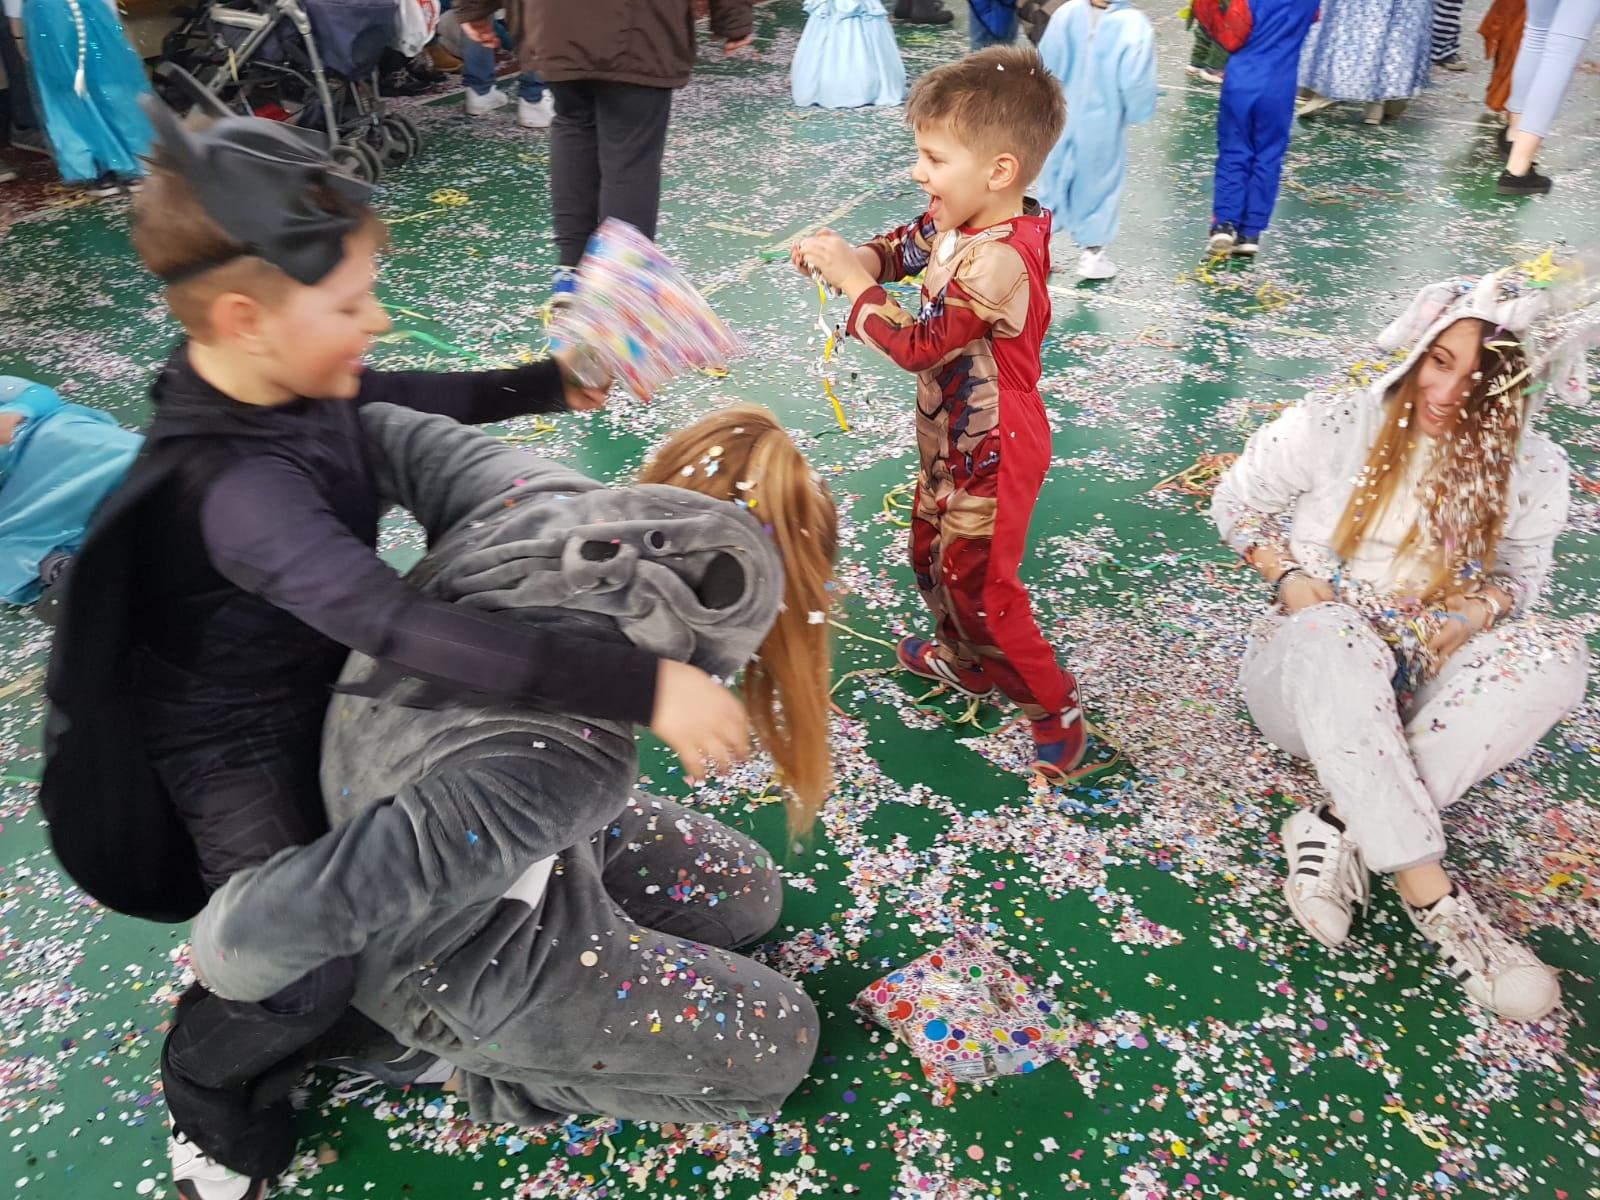 Baraonda Carnevale 2019 (109)